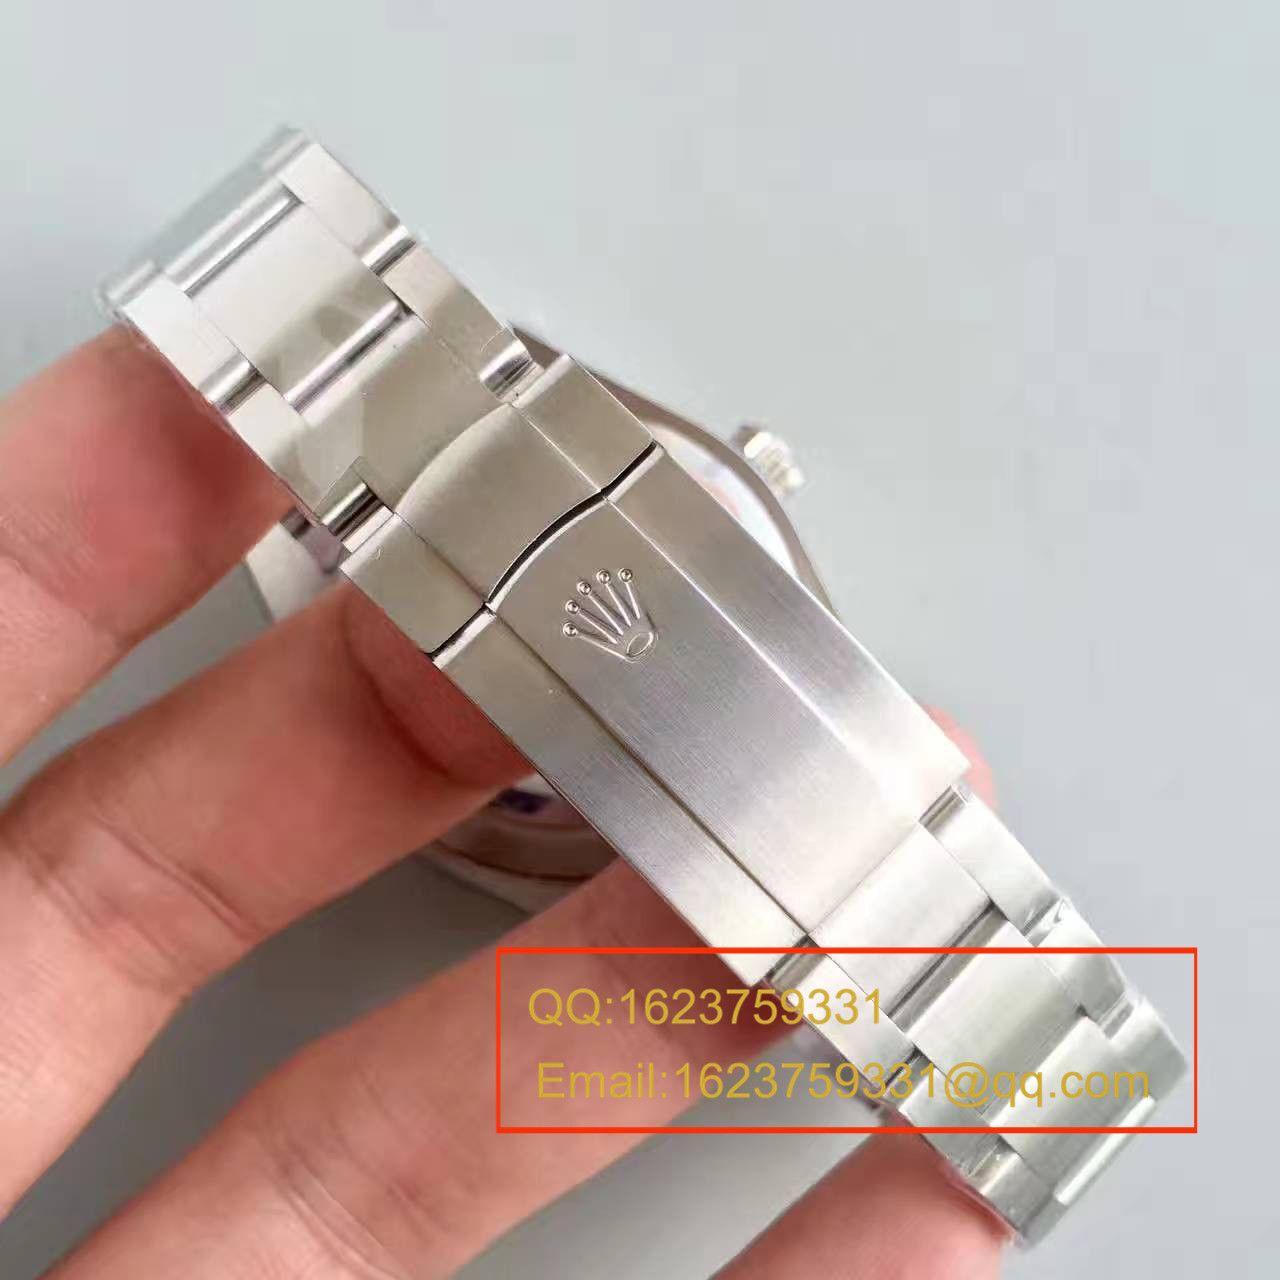 【JF厂V10S版本一比一复刻手表】劳力士空中霸王型系列AIR-KING116900-71200腕表 / R015.1